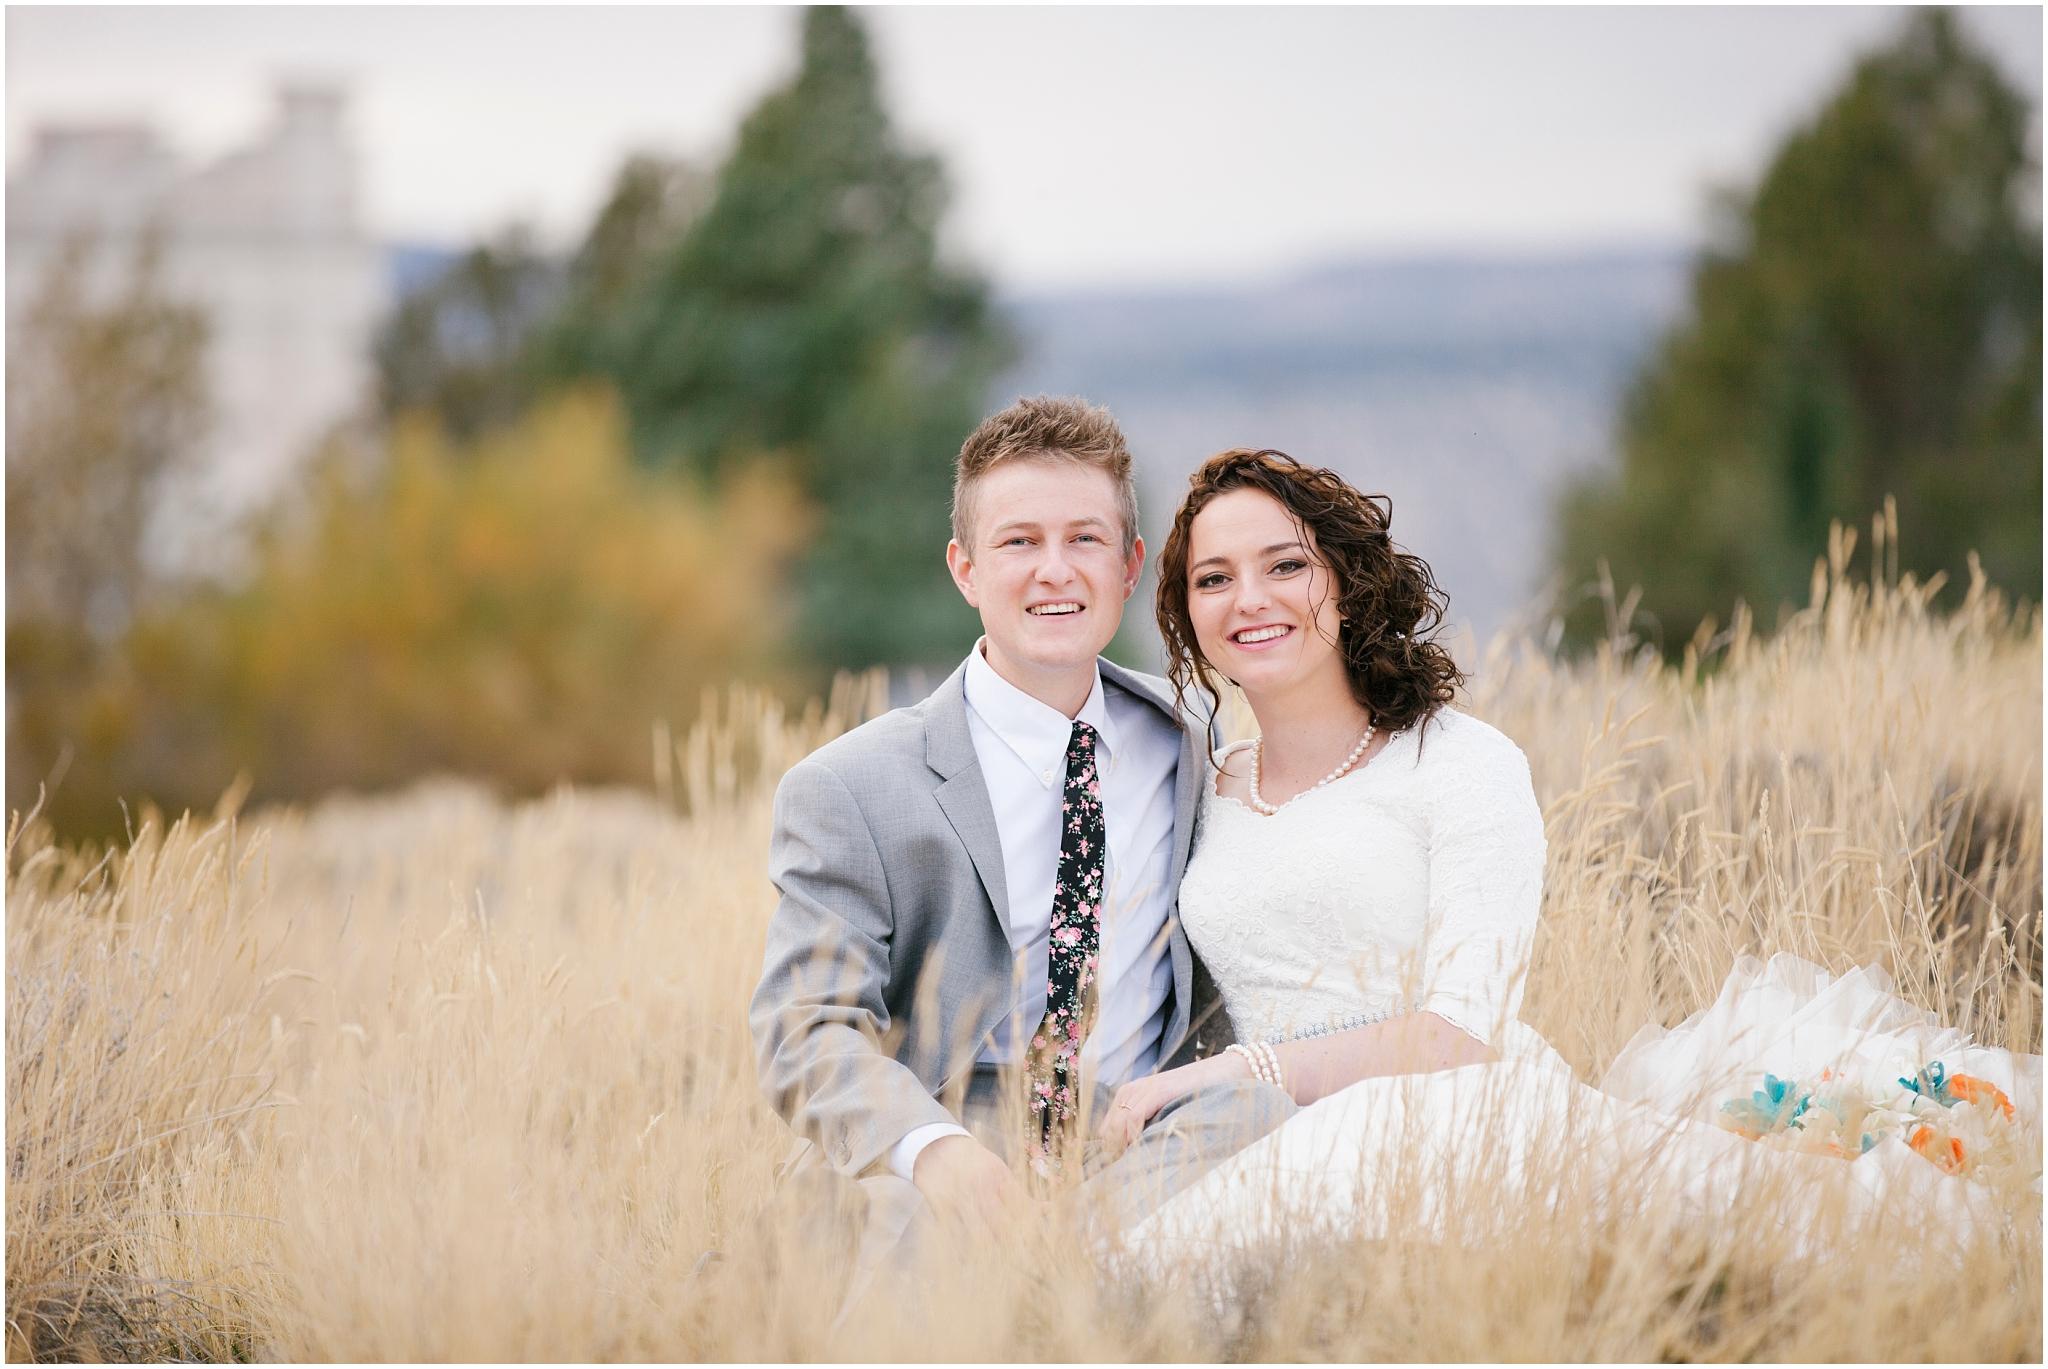 BA-Bridals-171_Lizzie-B-Imagery-Utah-Wedding-Photographer-Central-Utah-Photographer-Utah-County-Manti-Utah-Temple.jpg